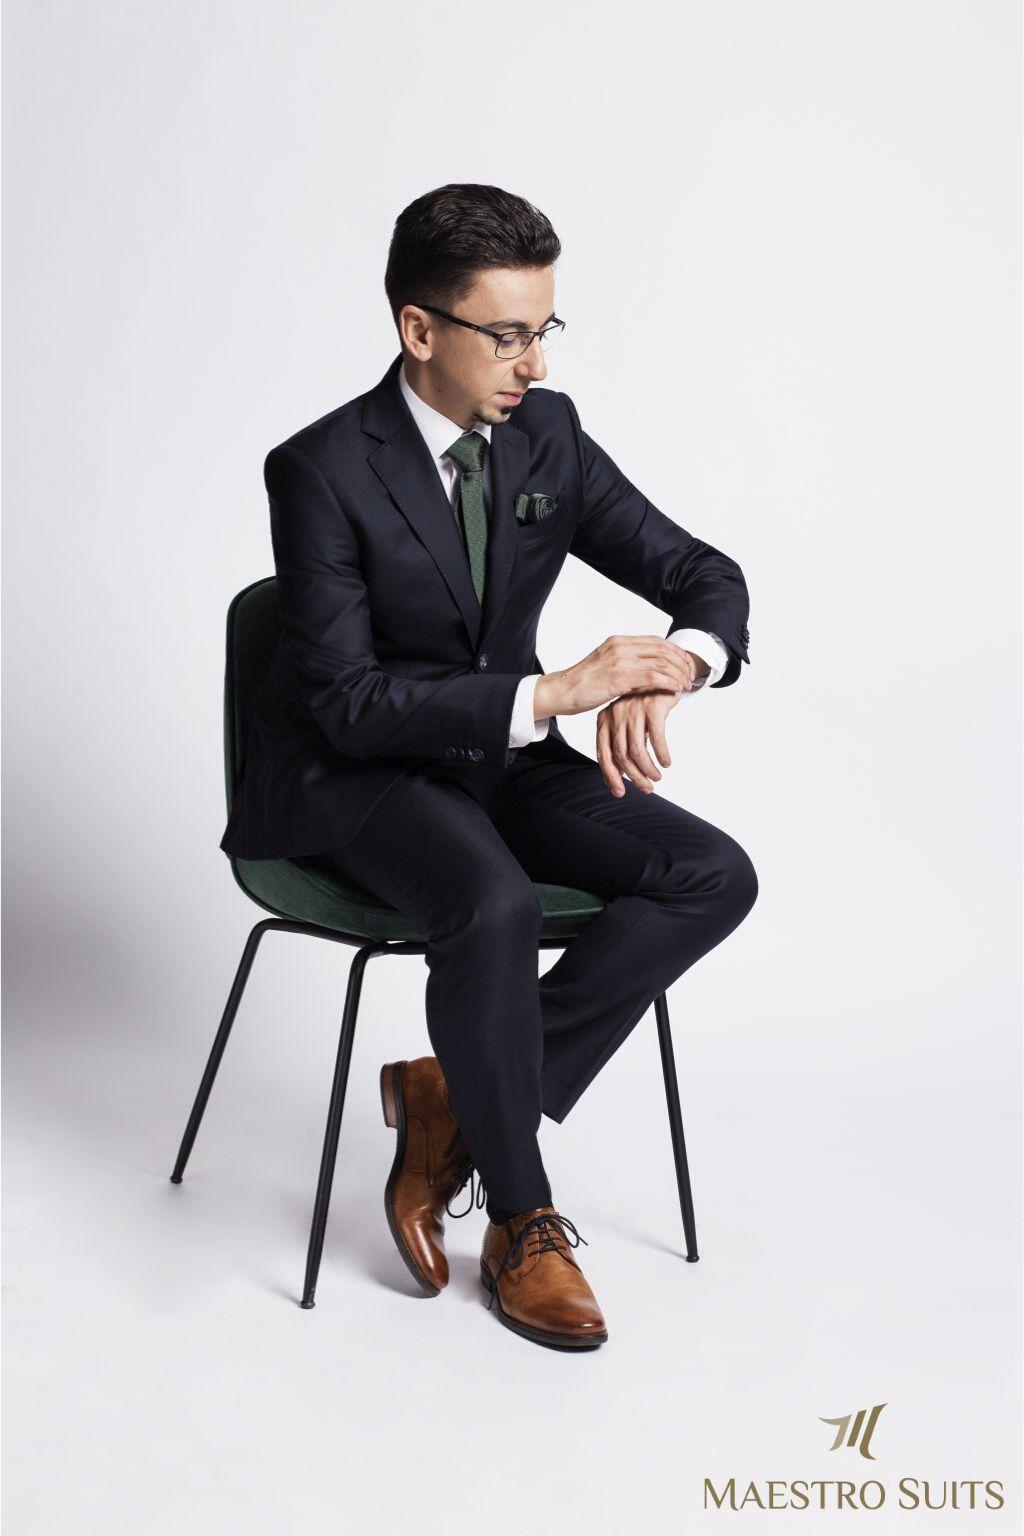 zvonko_komsic_maestro_suits (3)